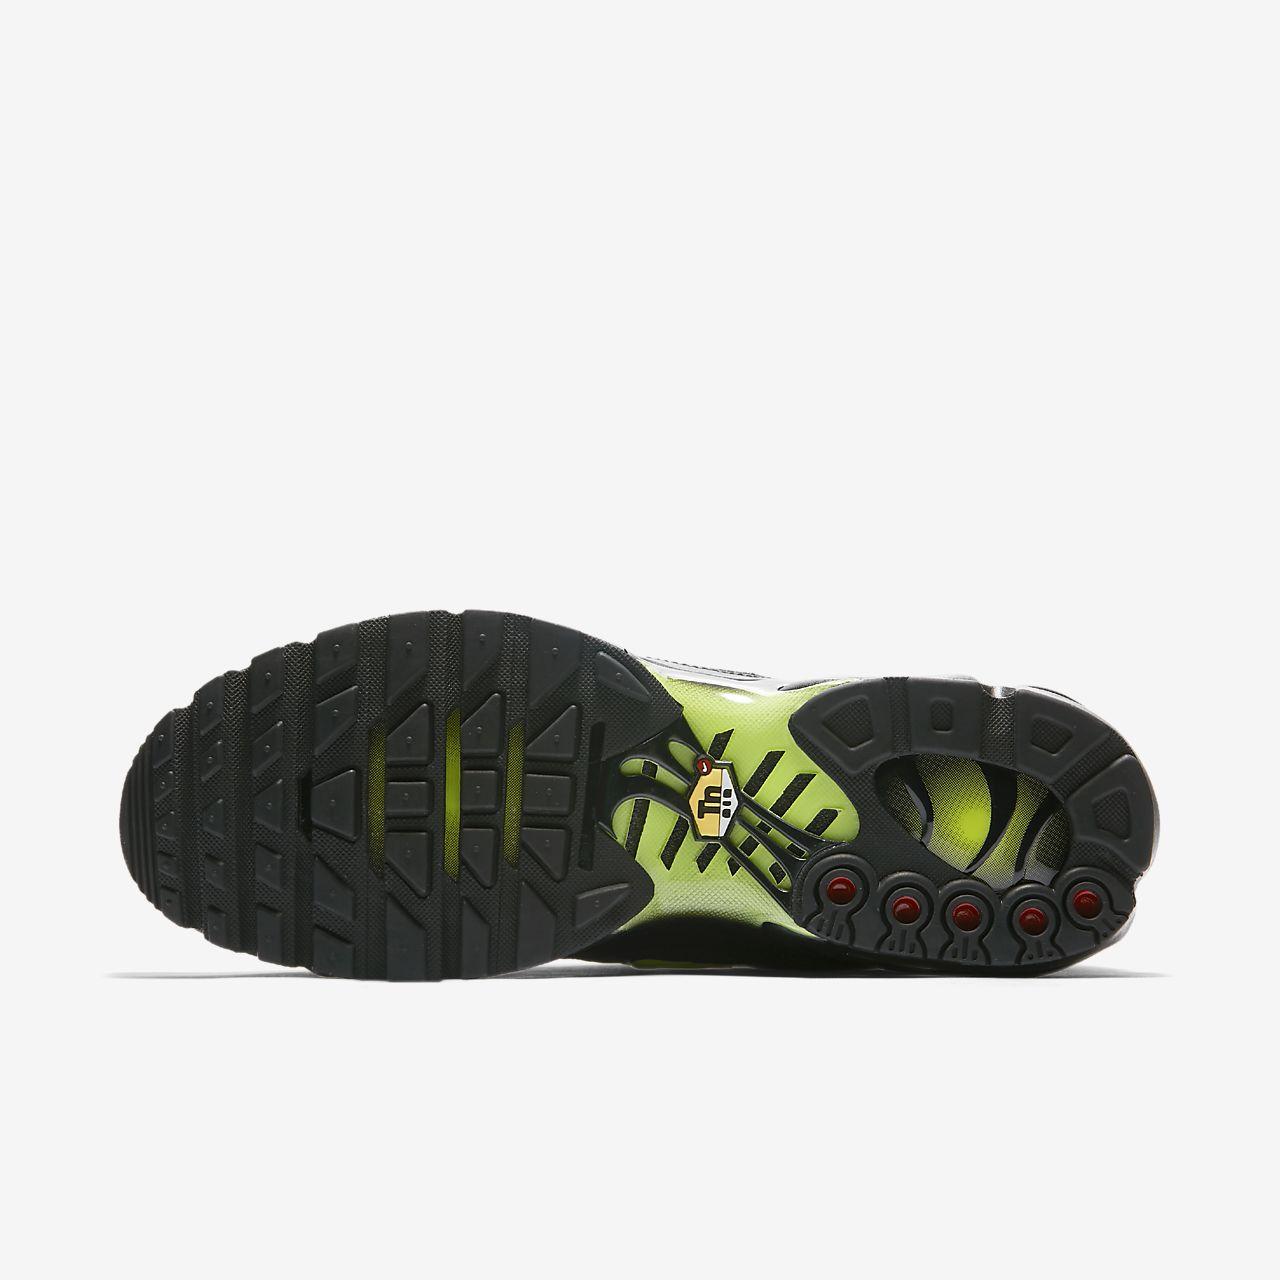 9c2e2aba Мужские кроссовки Nike Air Max Plus SE. Nike.com RU